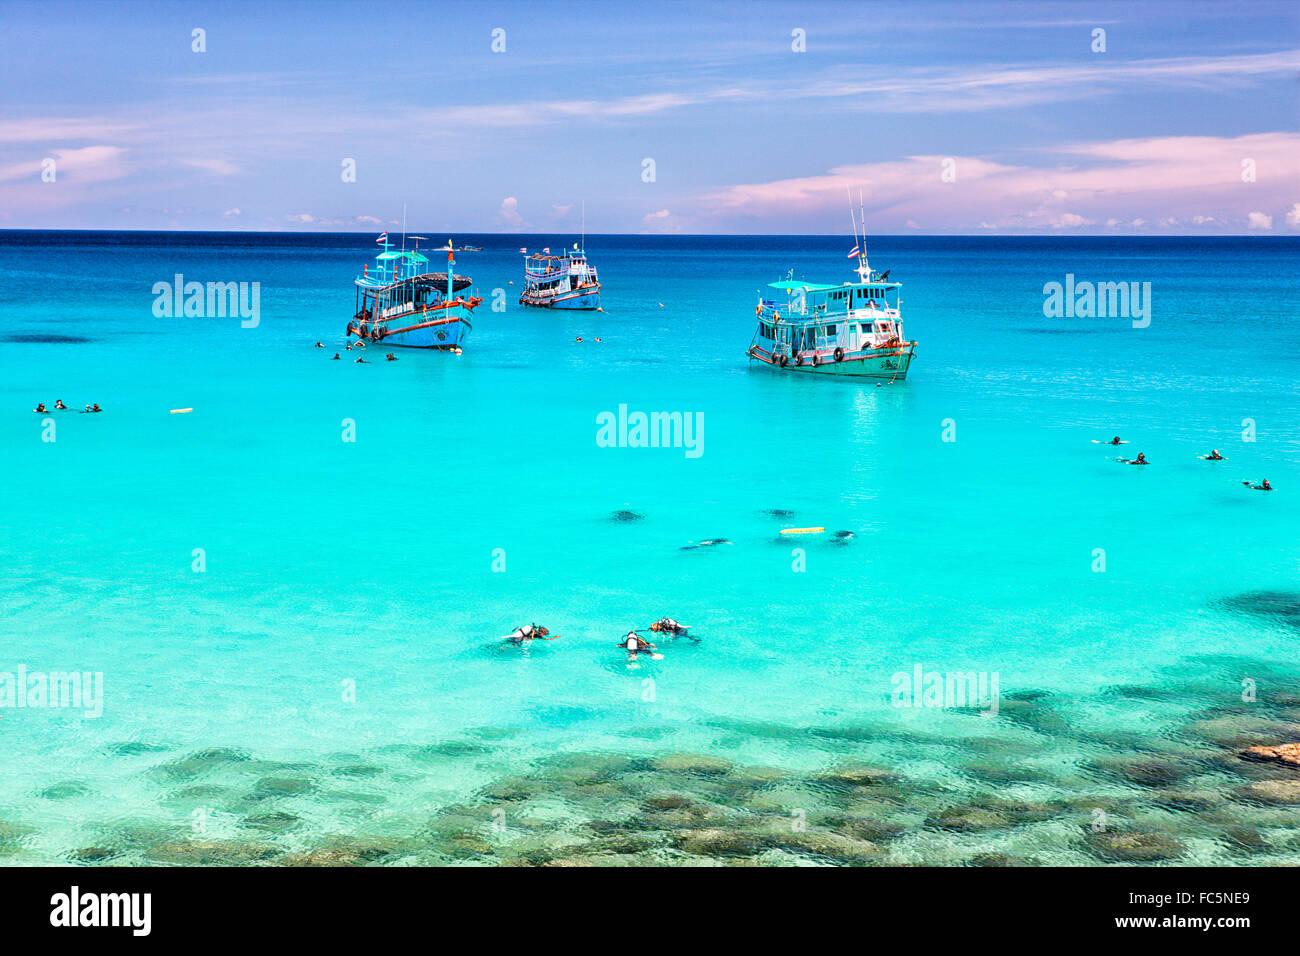 Aow Leuk; Koh Tao island; Surat Thani Province; Gulf thailand; South China Sea - Stock Image